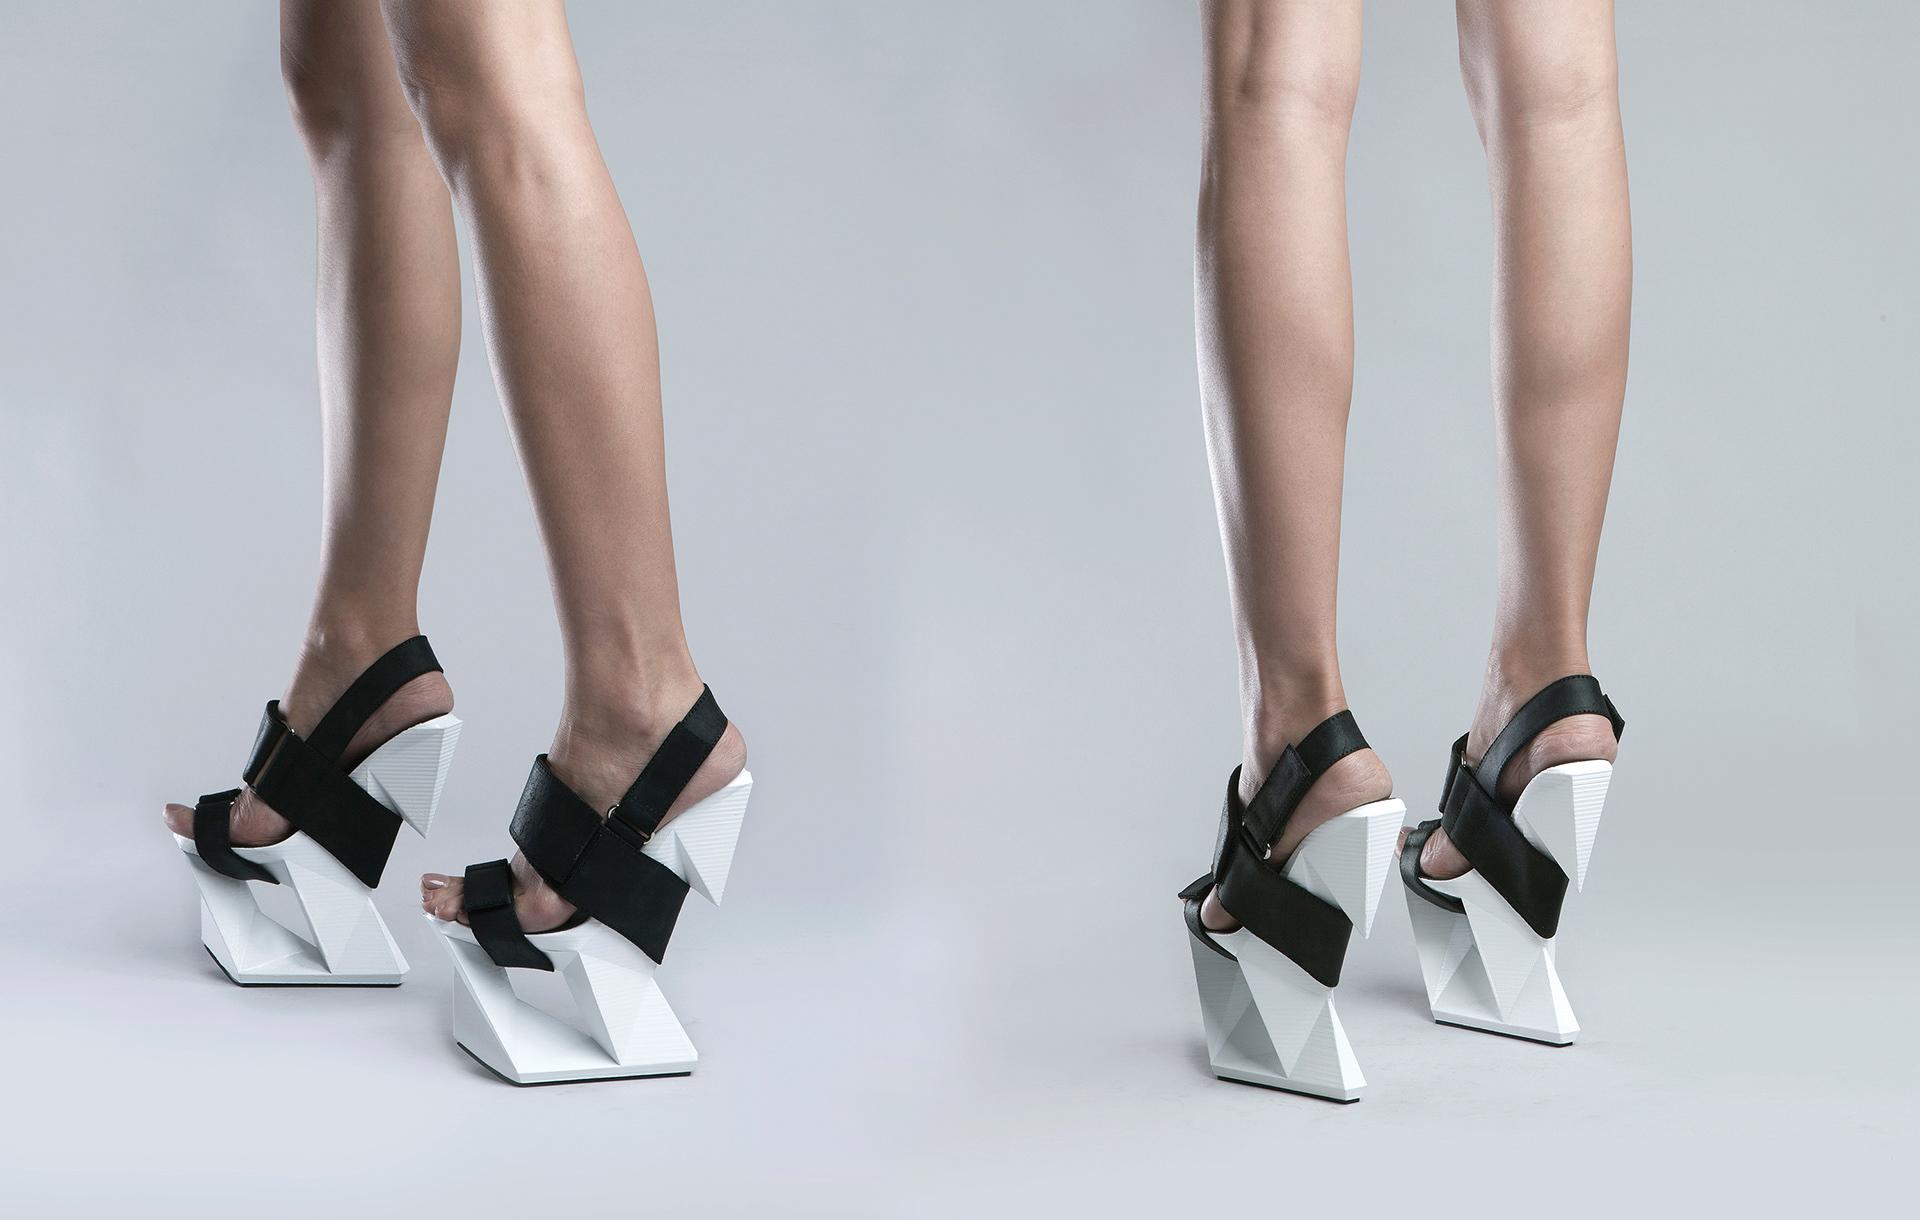 michal kukucka - ICE shoe / 3D printed concept shoe